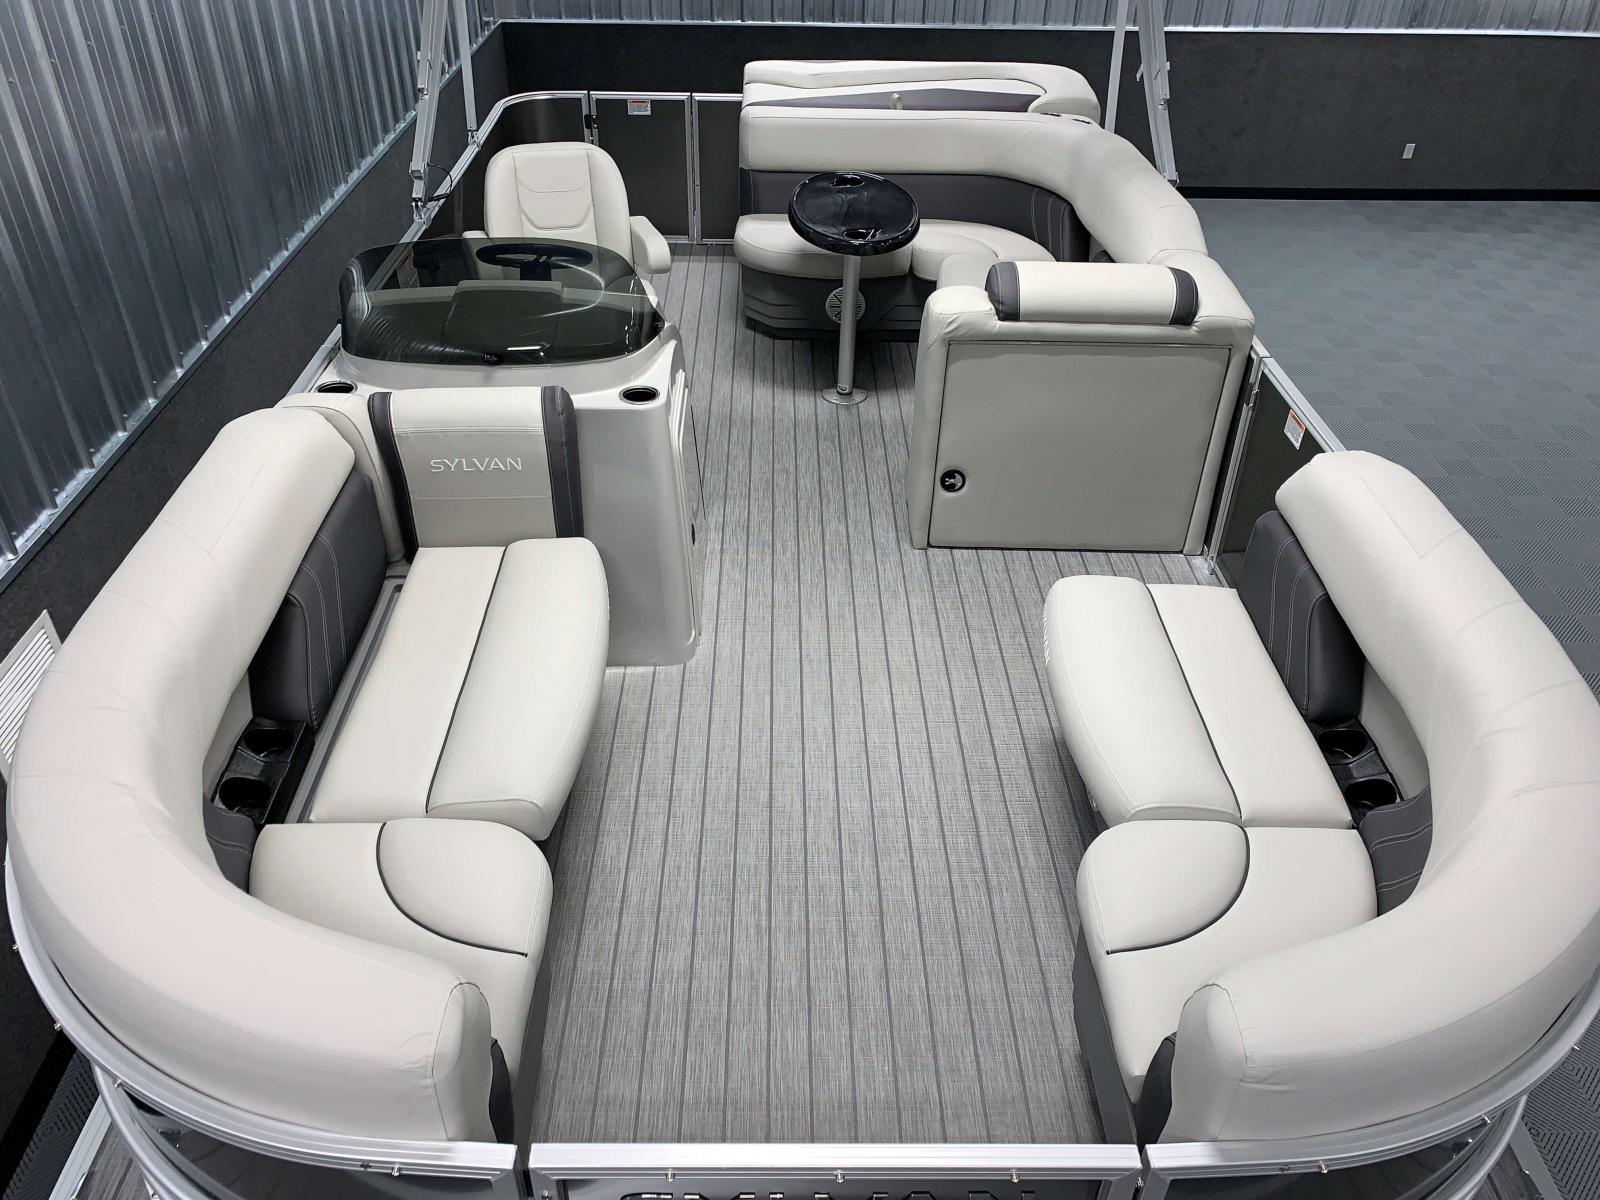 Interior Layout of a 2020 Sylvan Mirage 8520 Cruise Pontoon